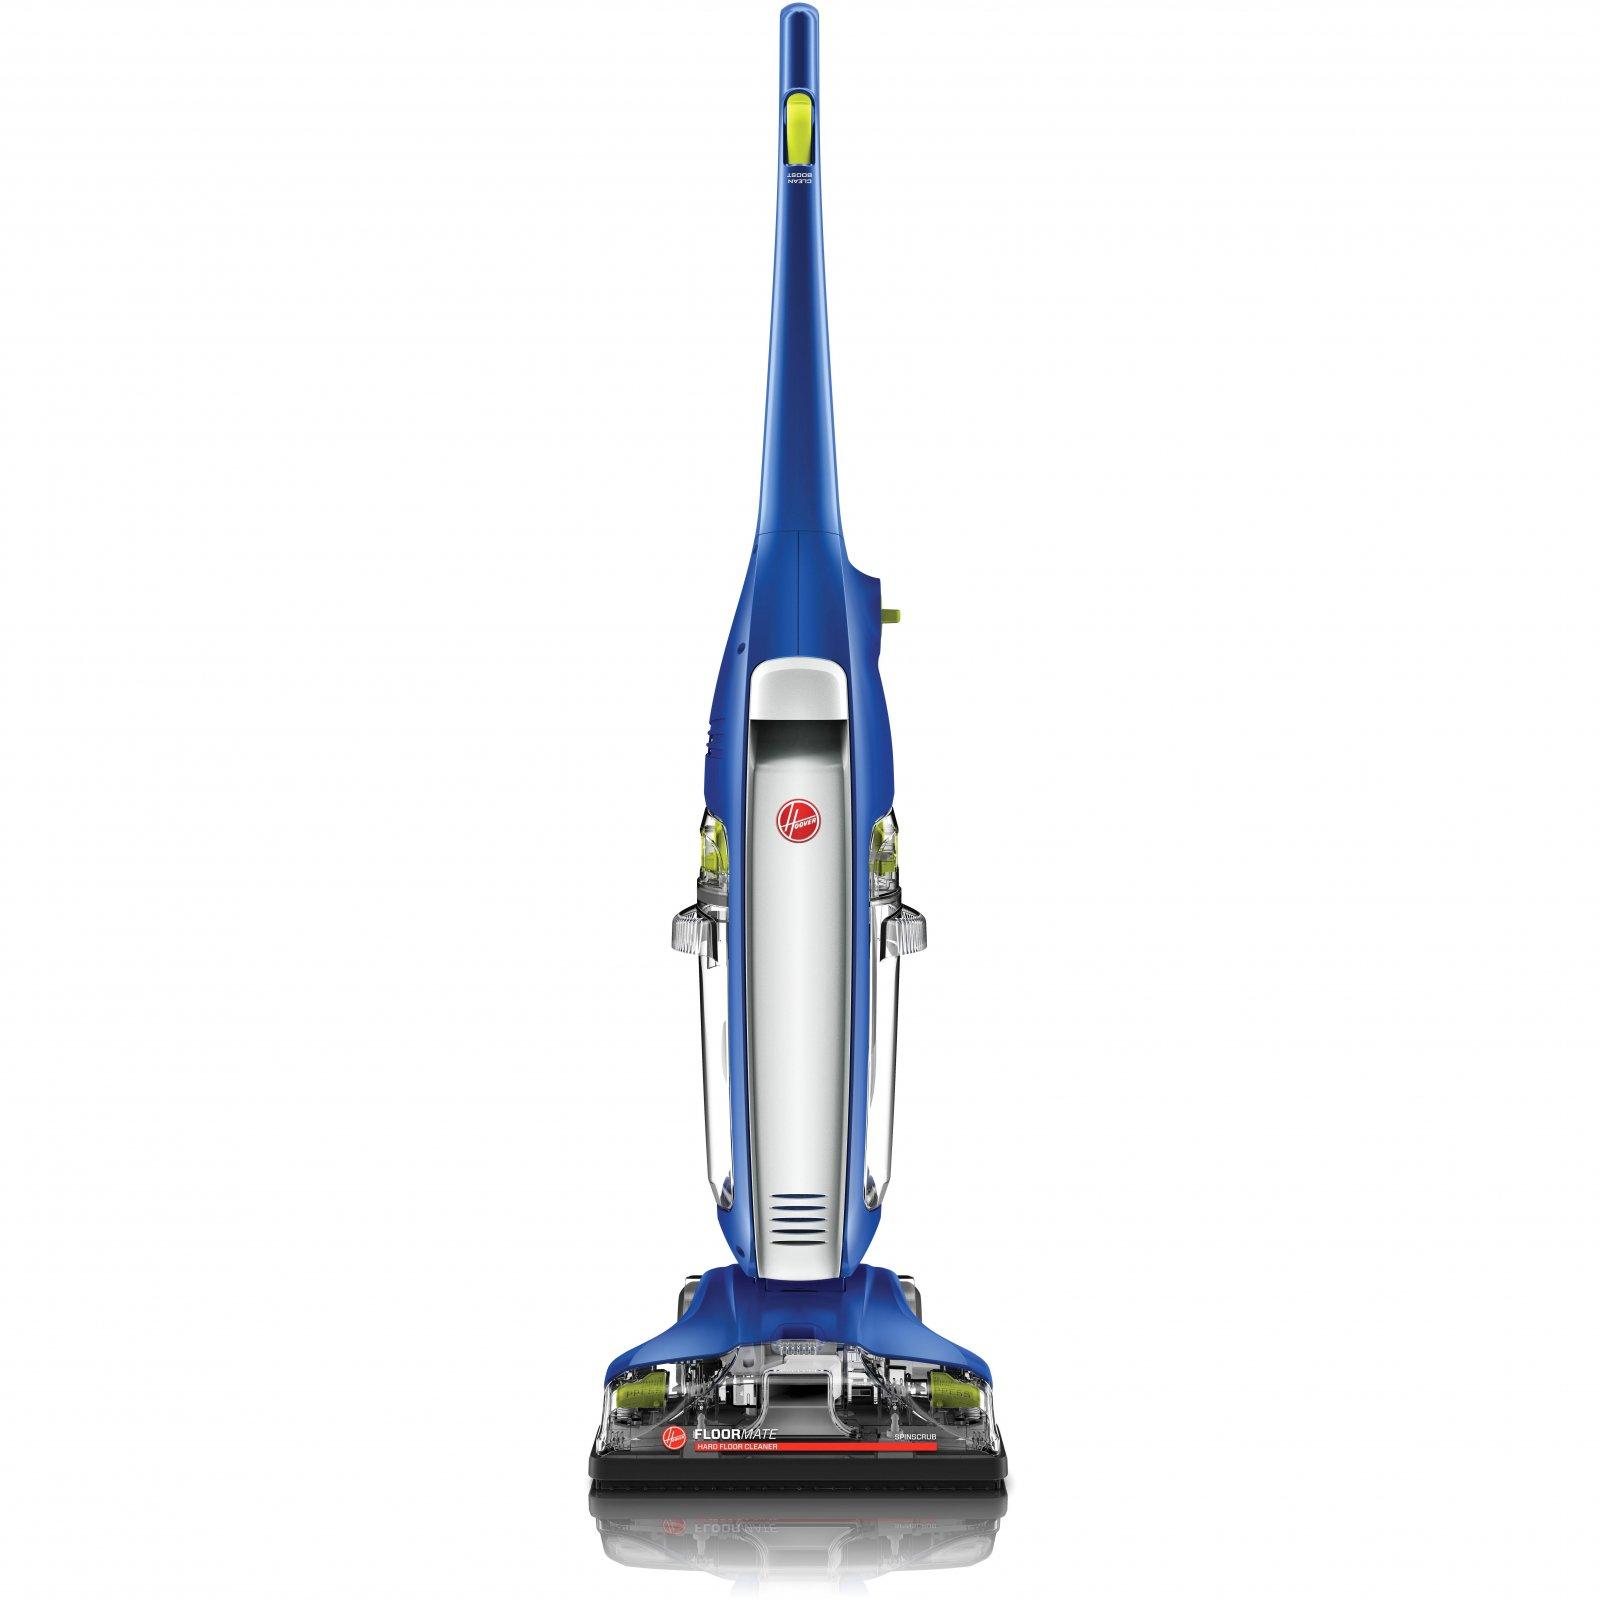 Hoover FloorMate Deluxe Hard Floor Cleaner, FH40150